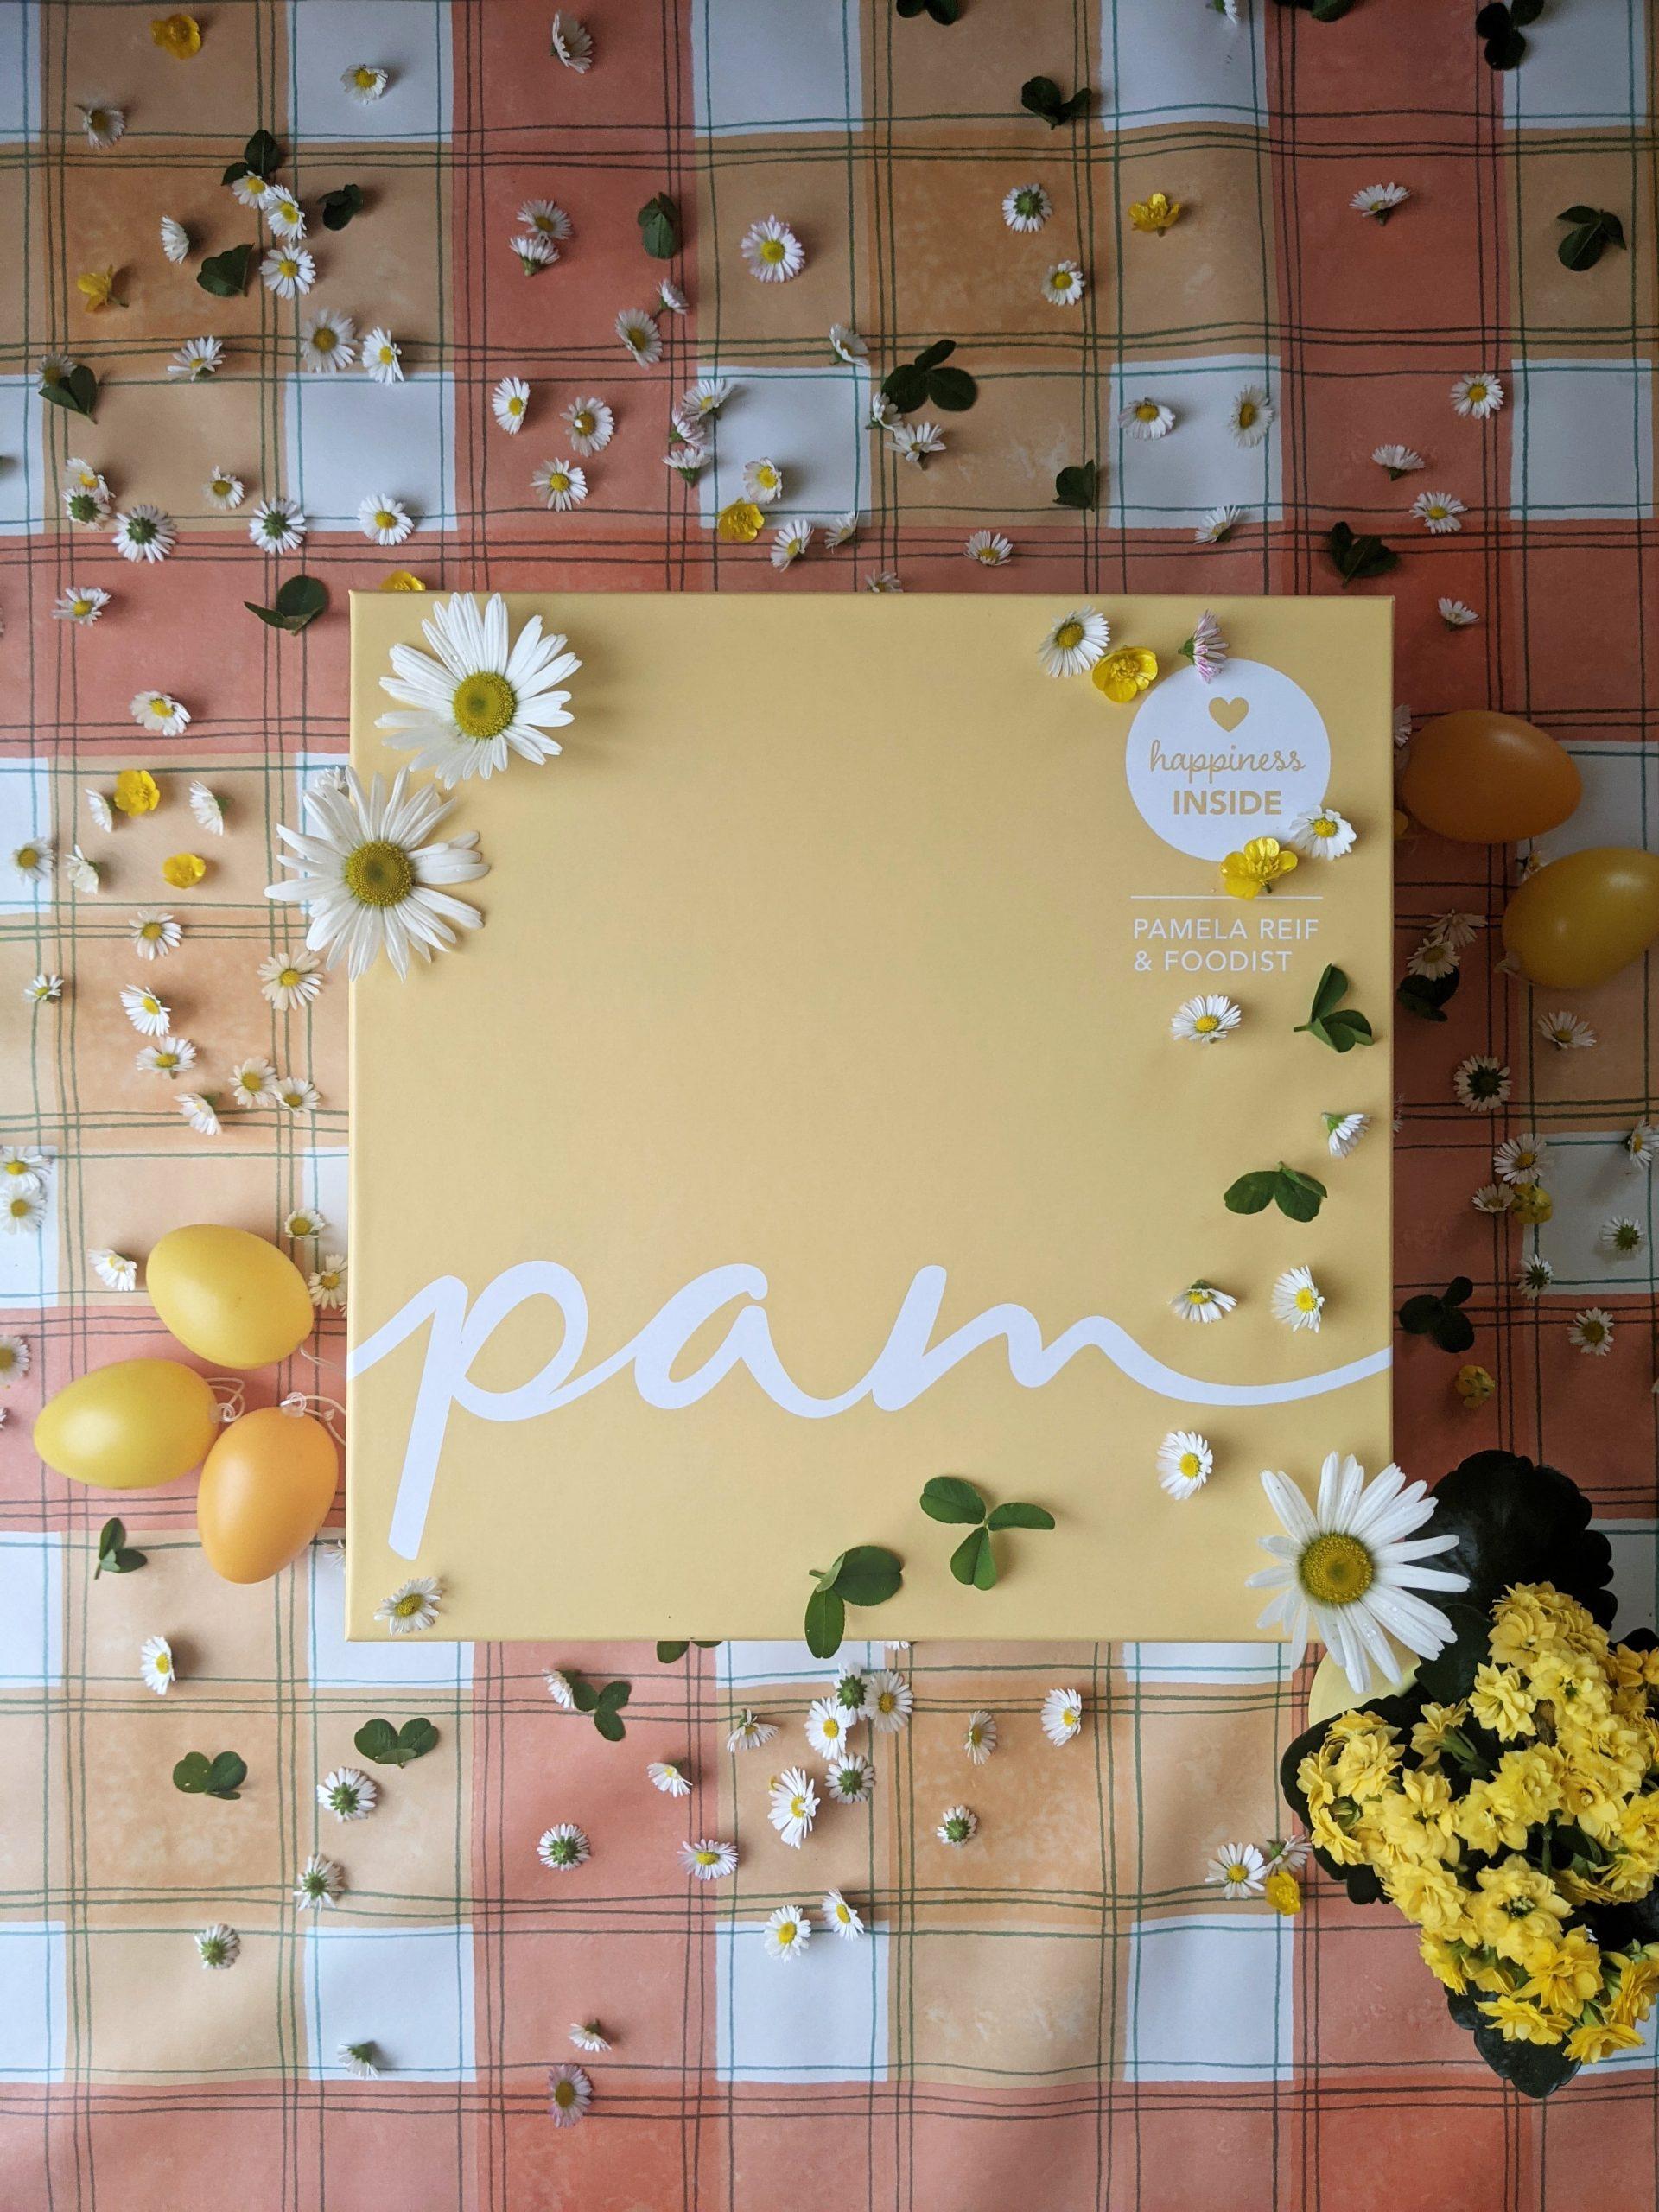 Pam Box April 2021